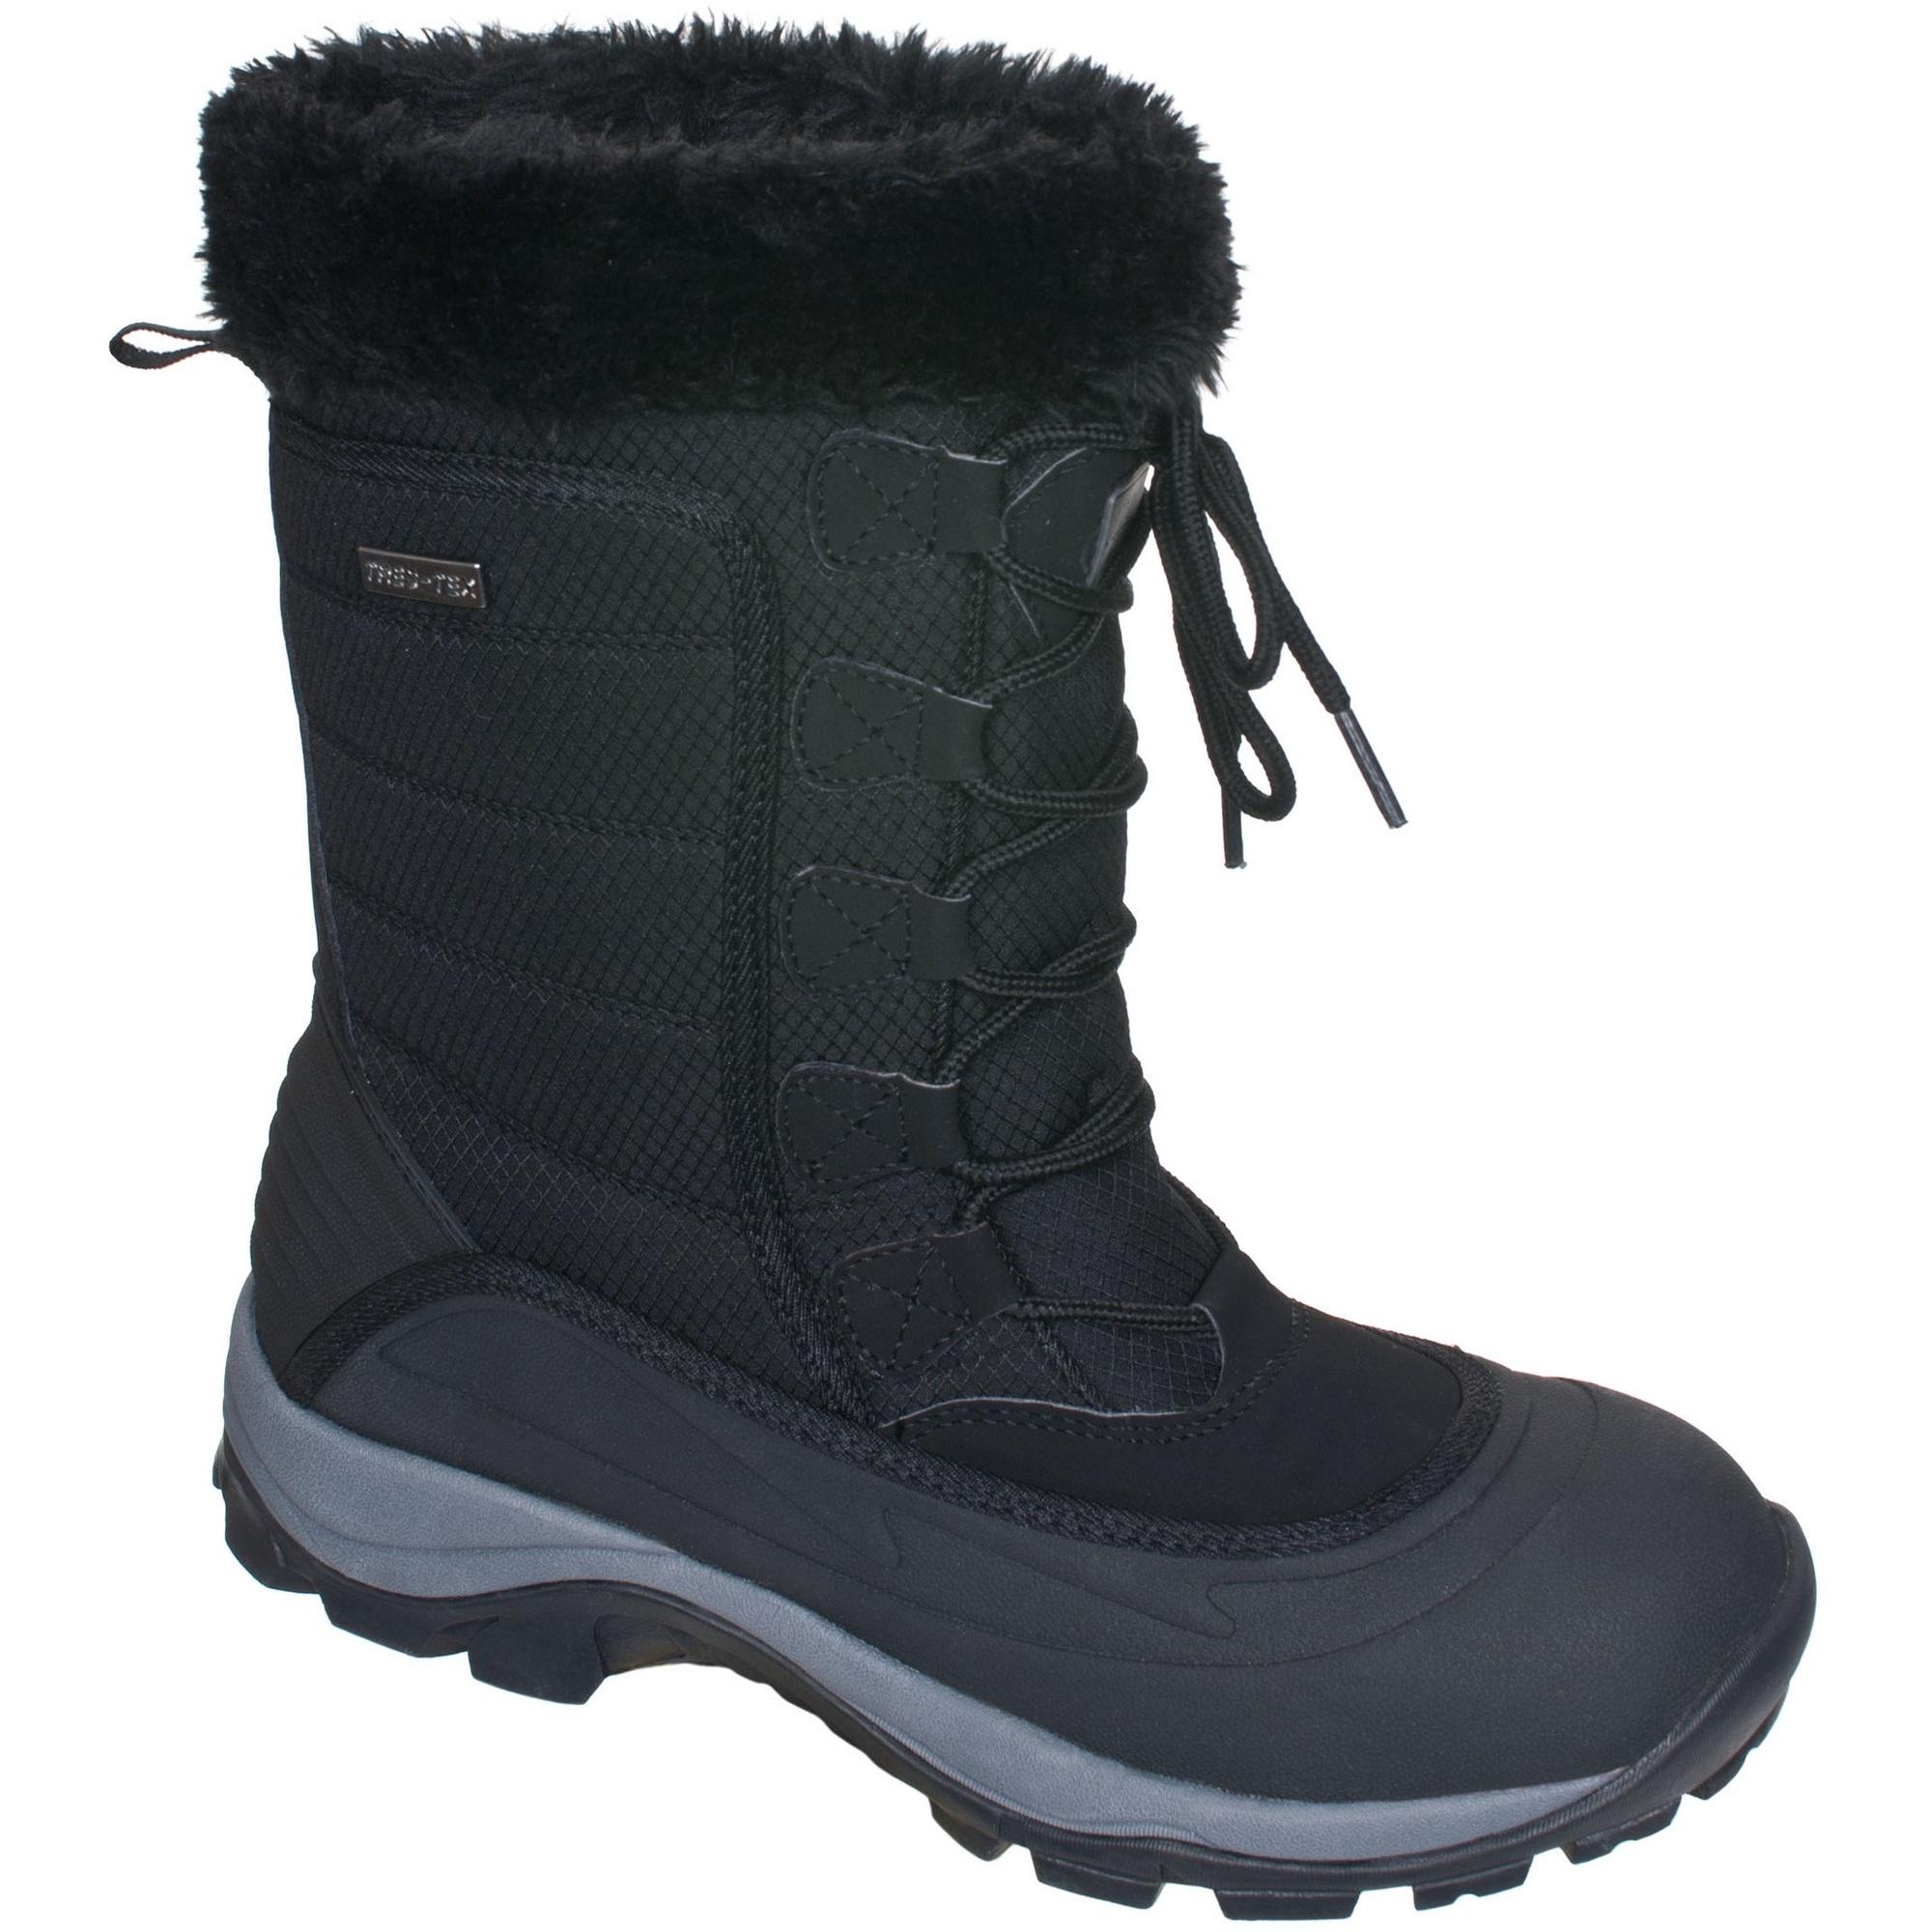 Trespass Childrens Snow Boots Uk | Homewood Mountain Ski Resort